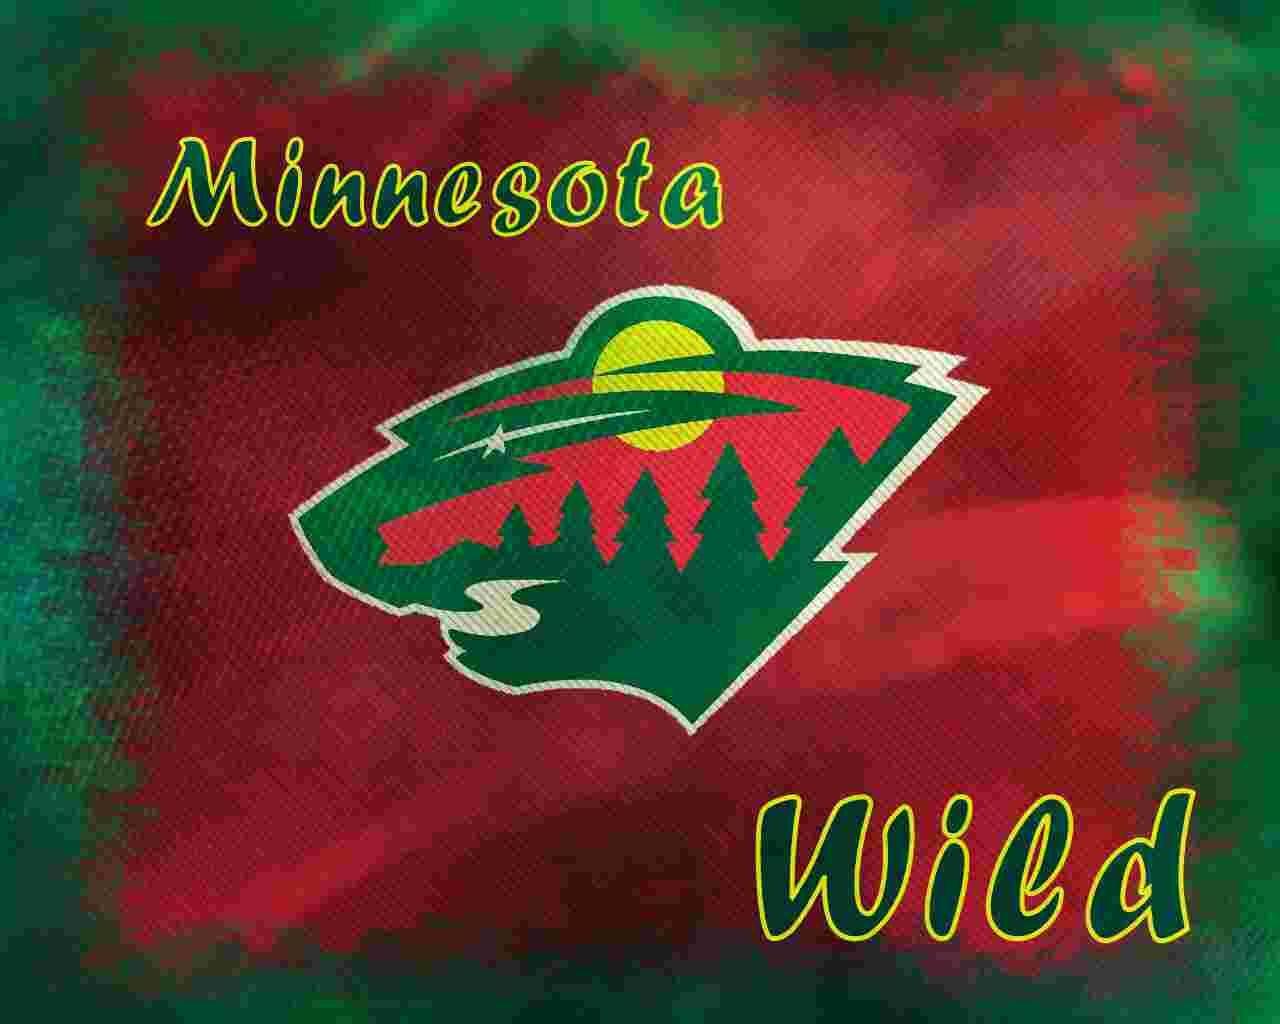 Minnesota Wild Wallpaper 10355